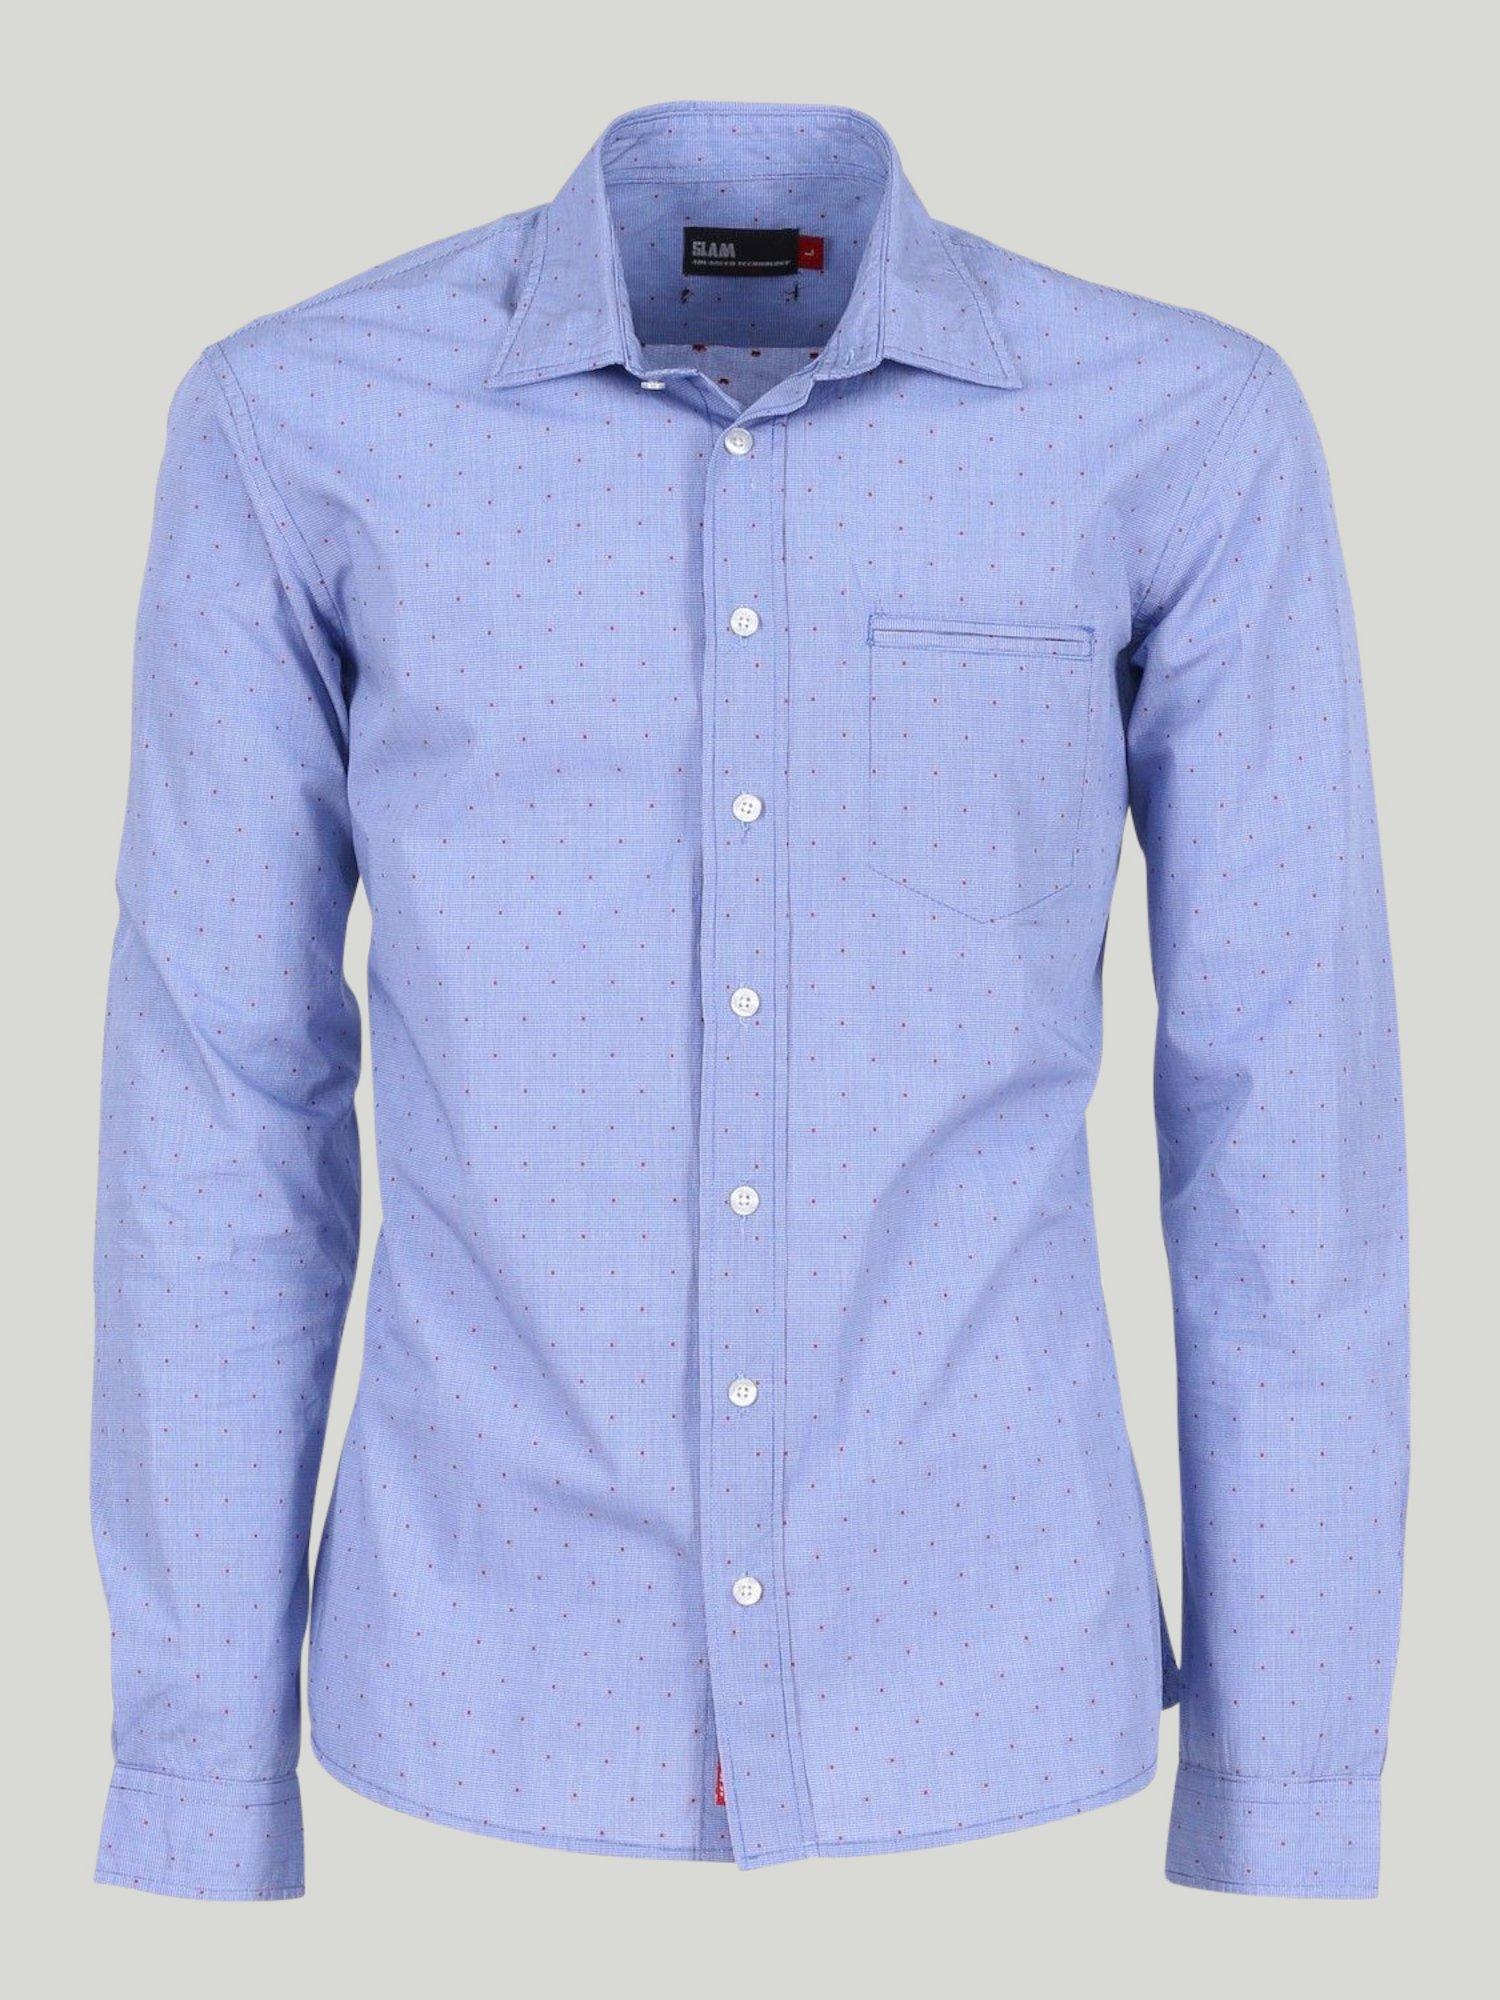 Founder shirt - Microcheck Blue / White